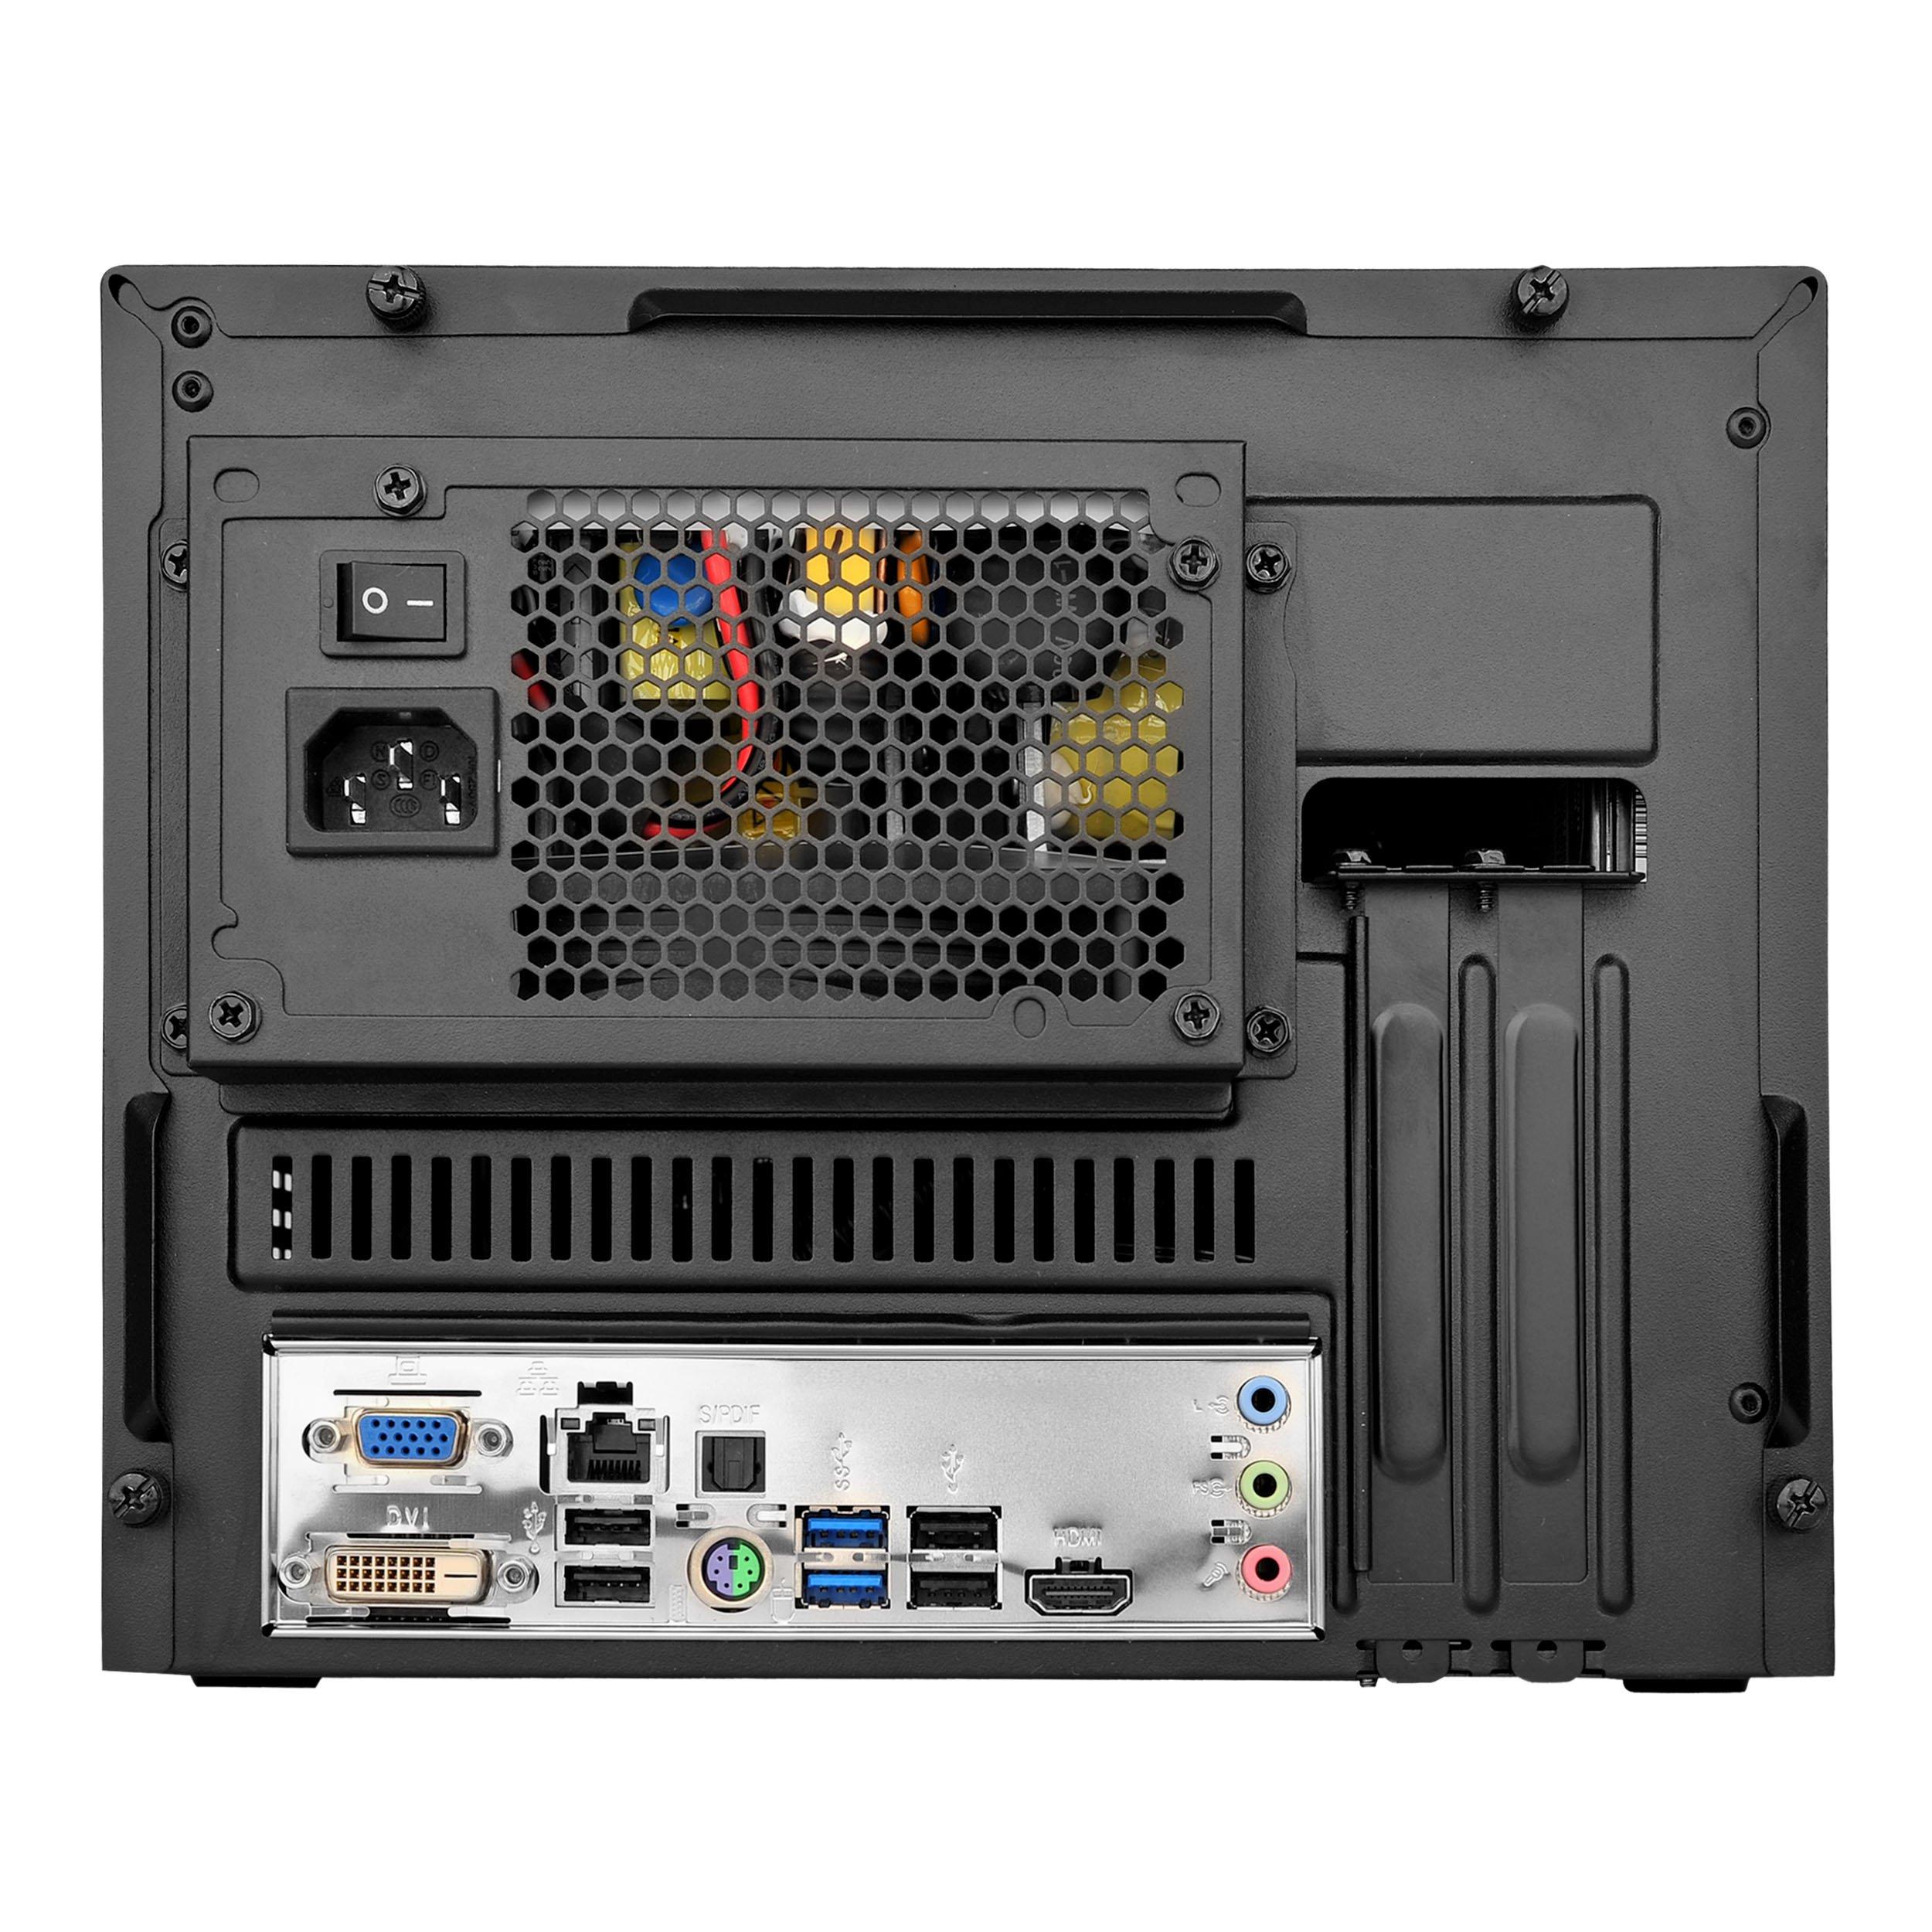 Cooler Master Elite 110 Mini-ITX Computer Case (RC-110-KKN2) by Cooler Master (Image #21)